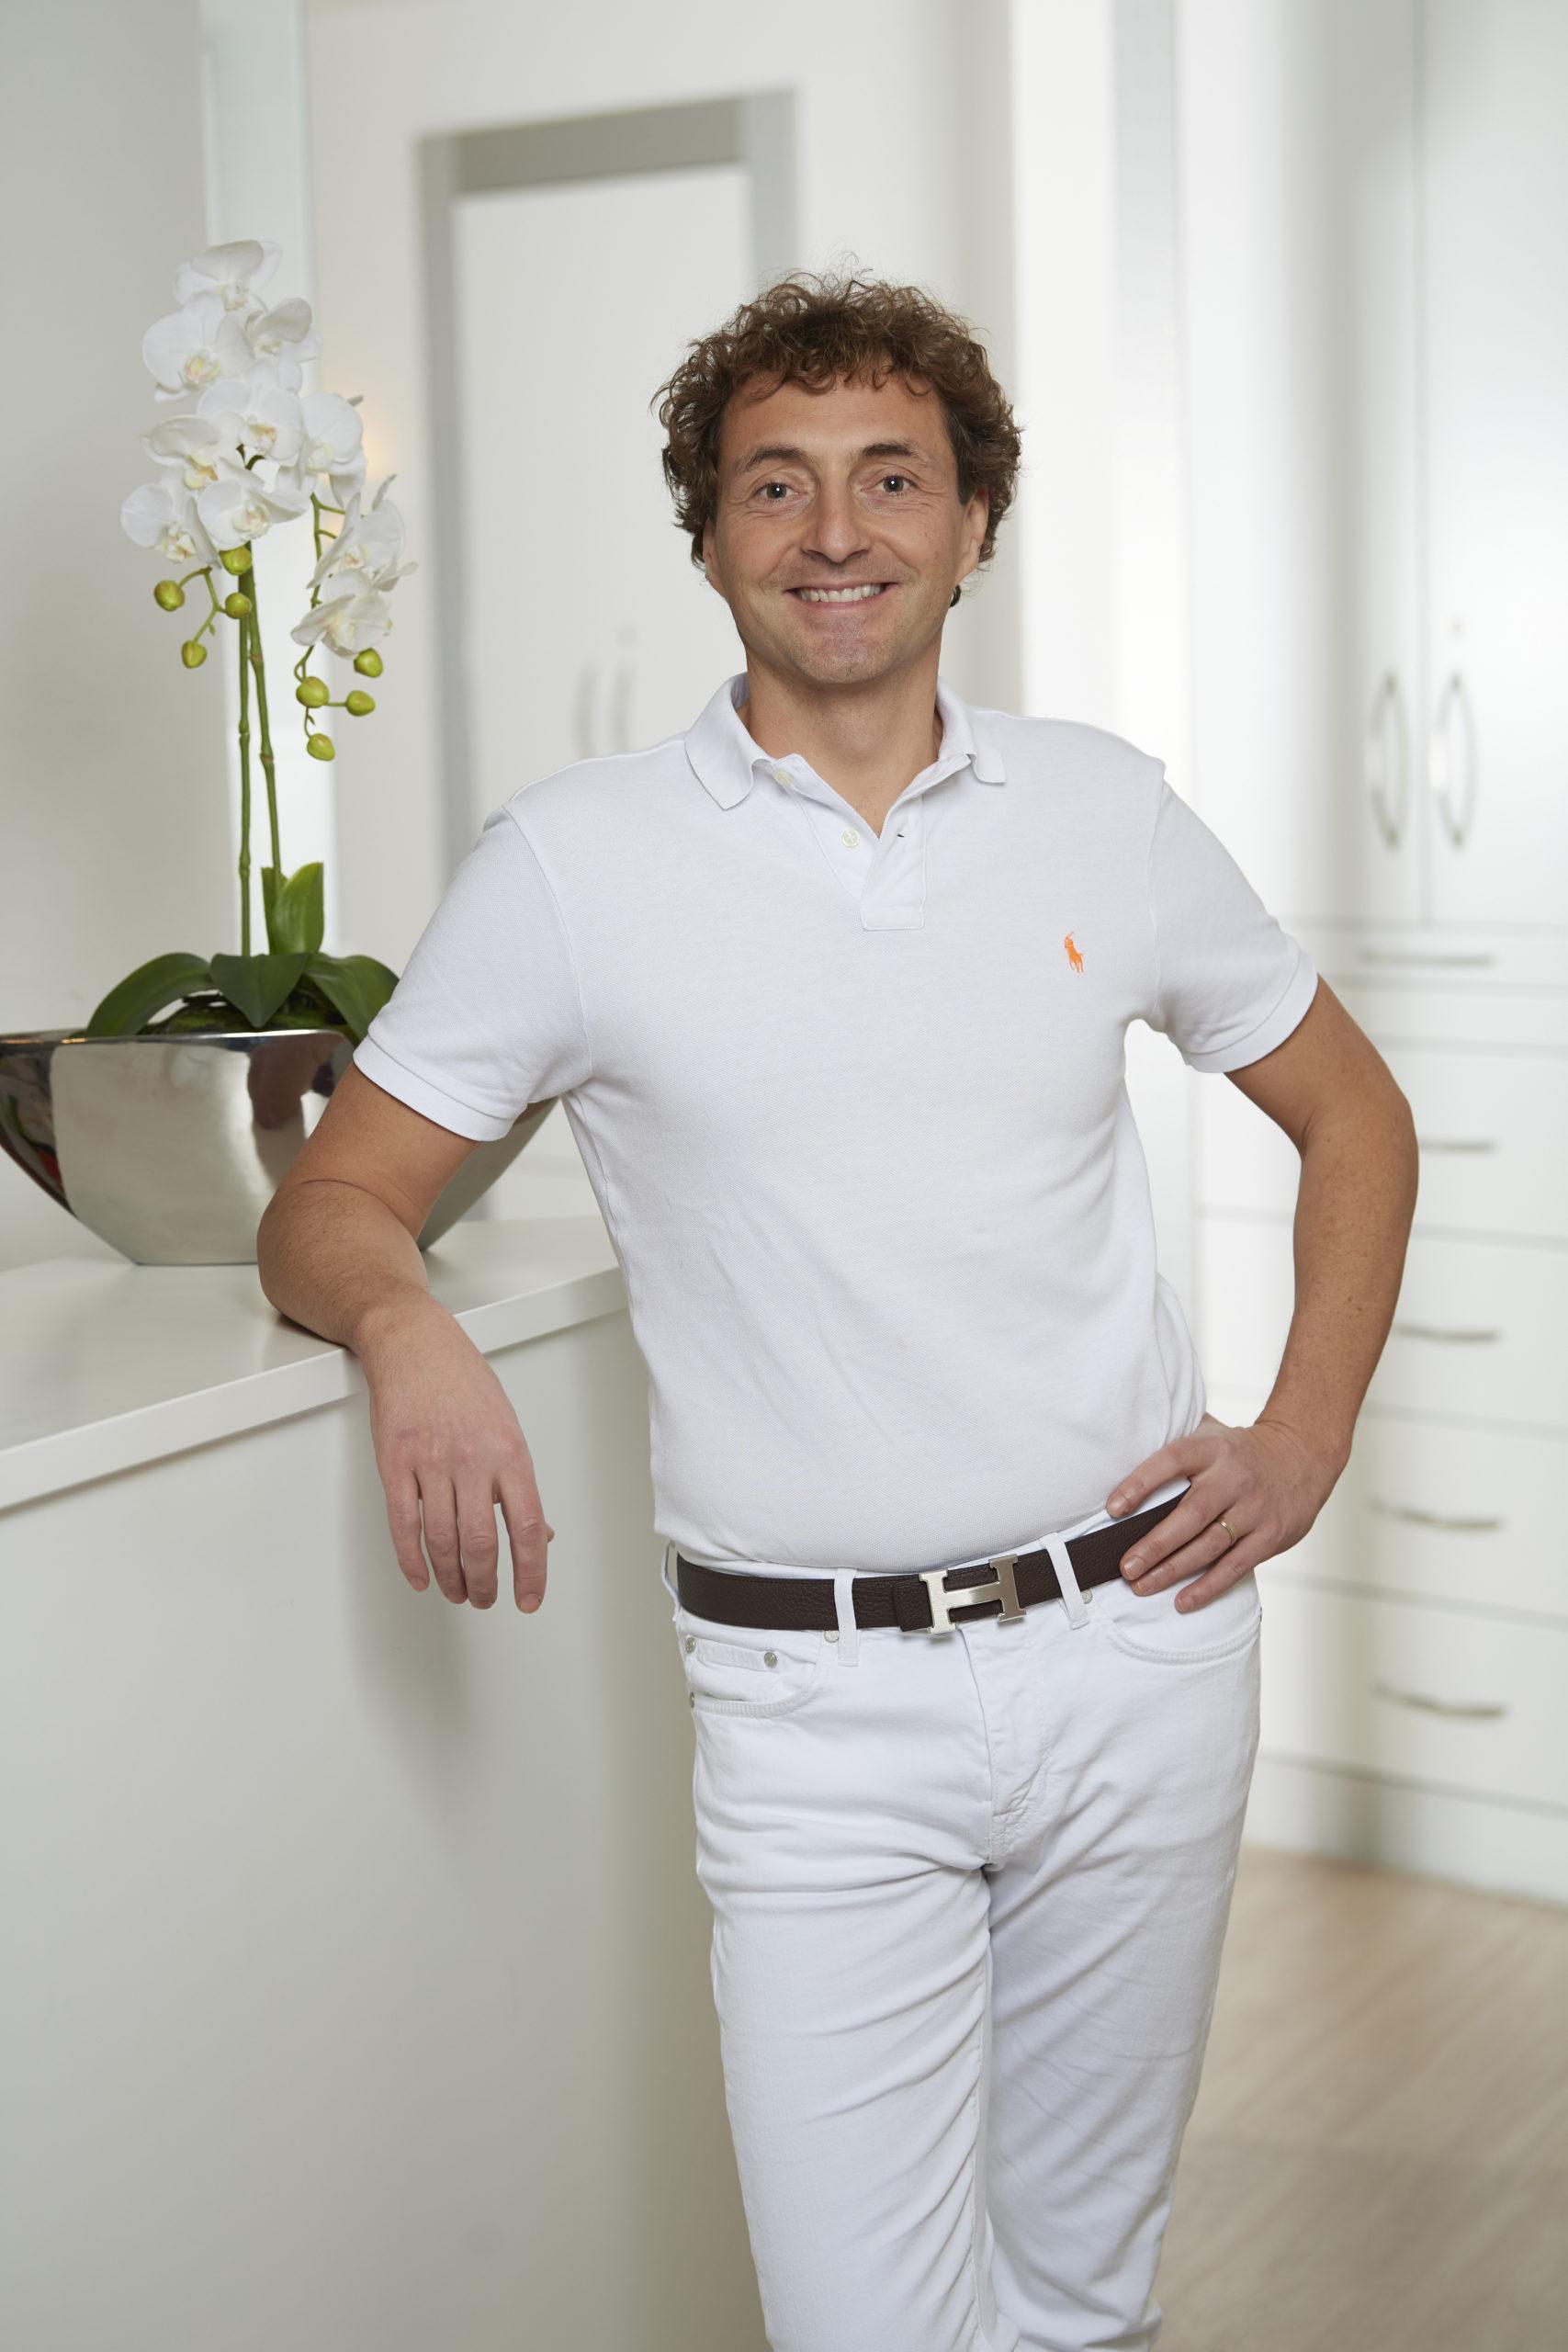 Dr. Boris Mundweil